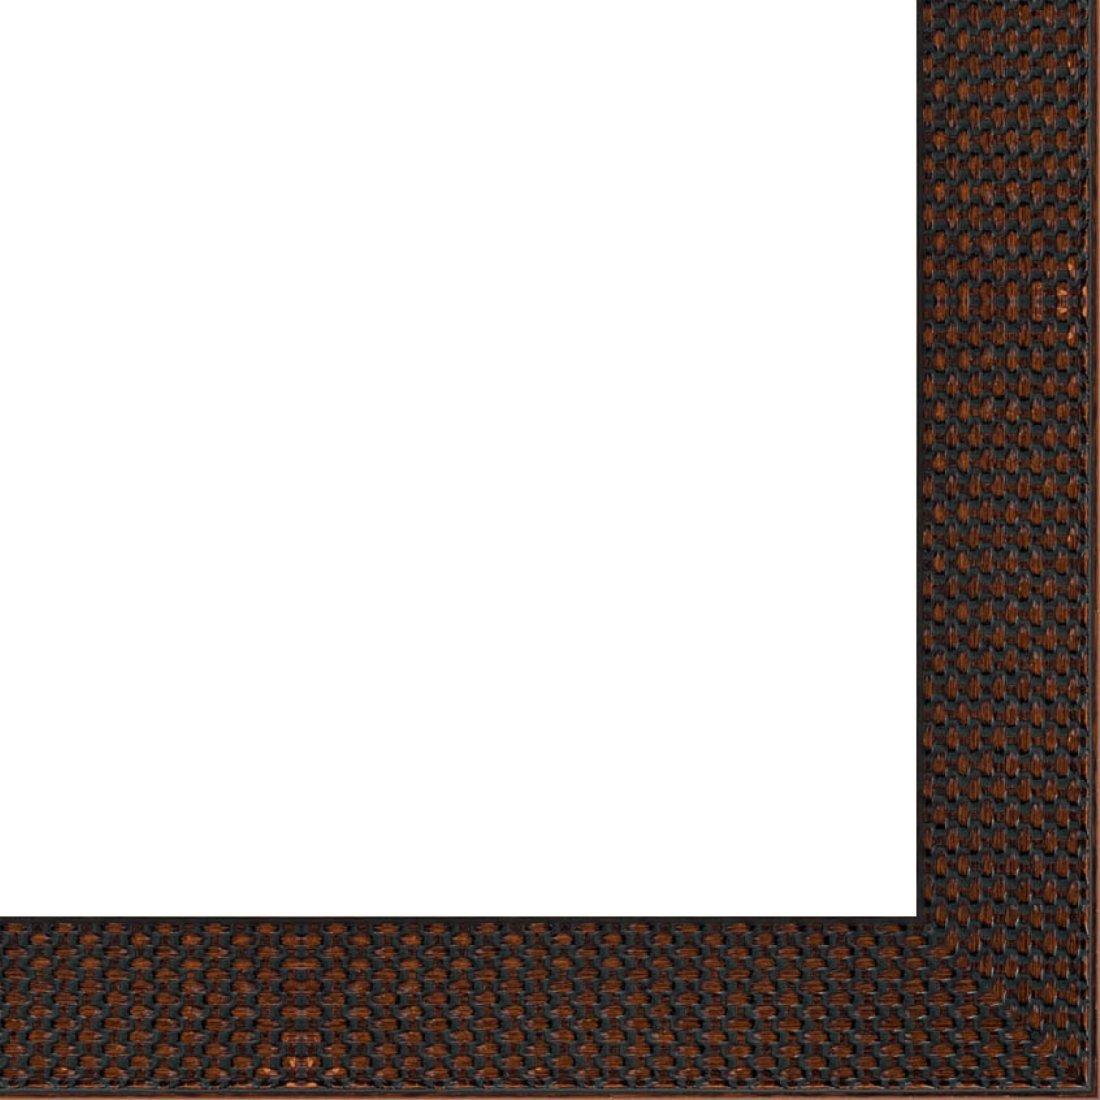 Picture Frame Moulding (Wood) 18ft bundle - Traditional Mahogany Finish - 2'' width - 5/16'' rabbet depth